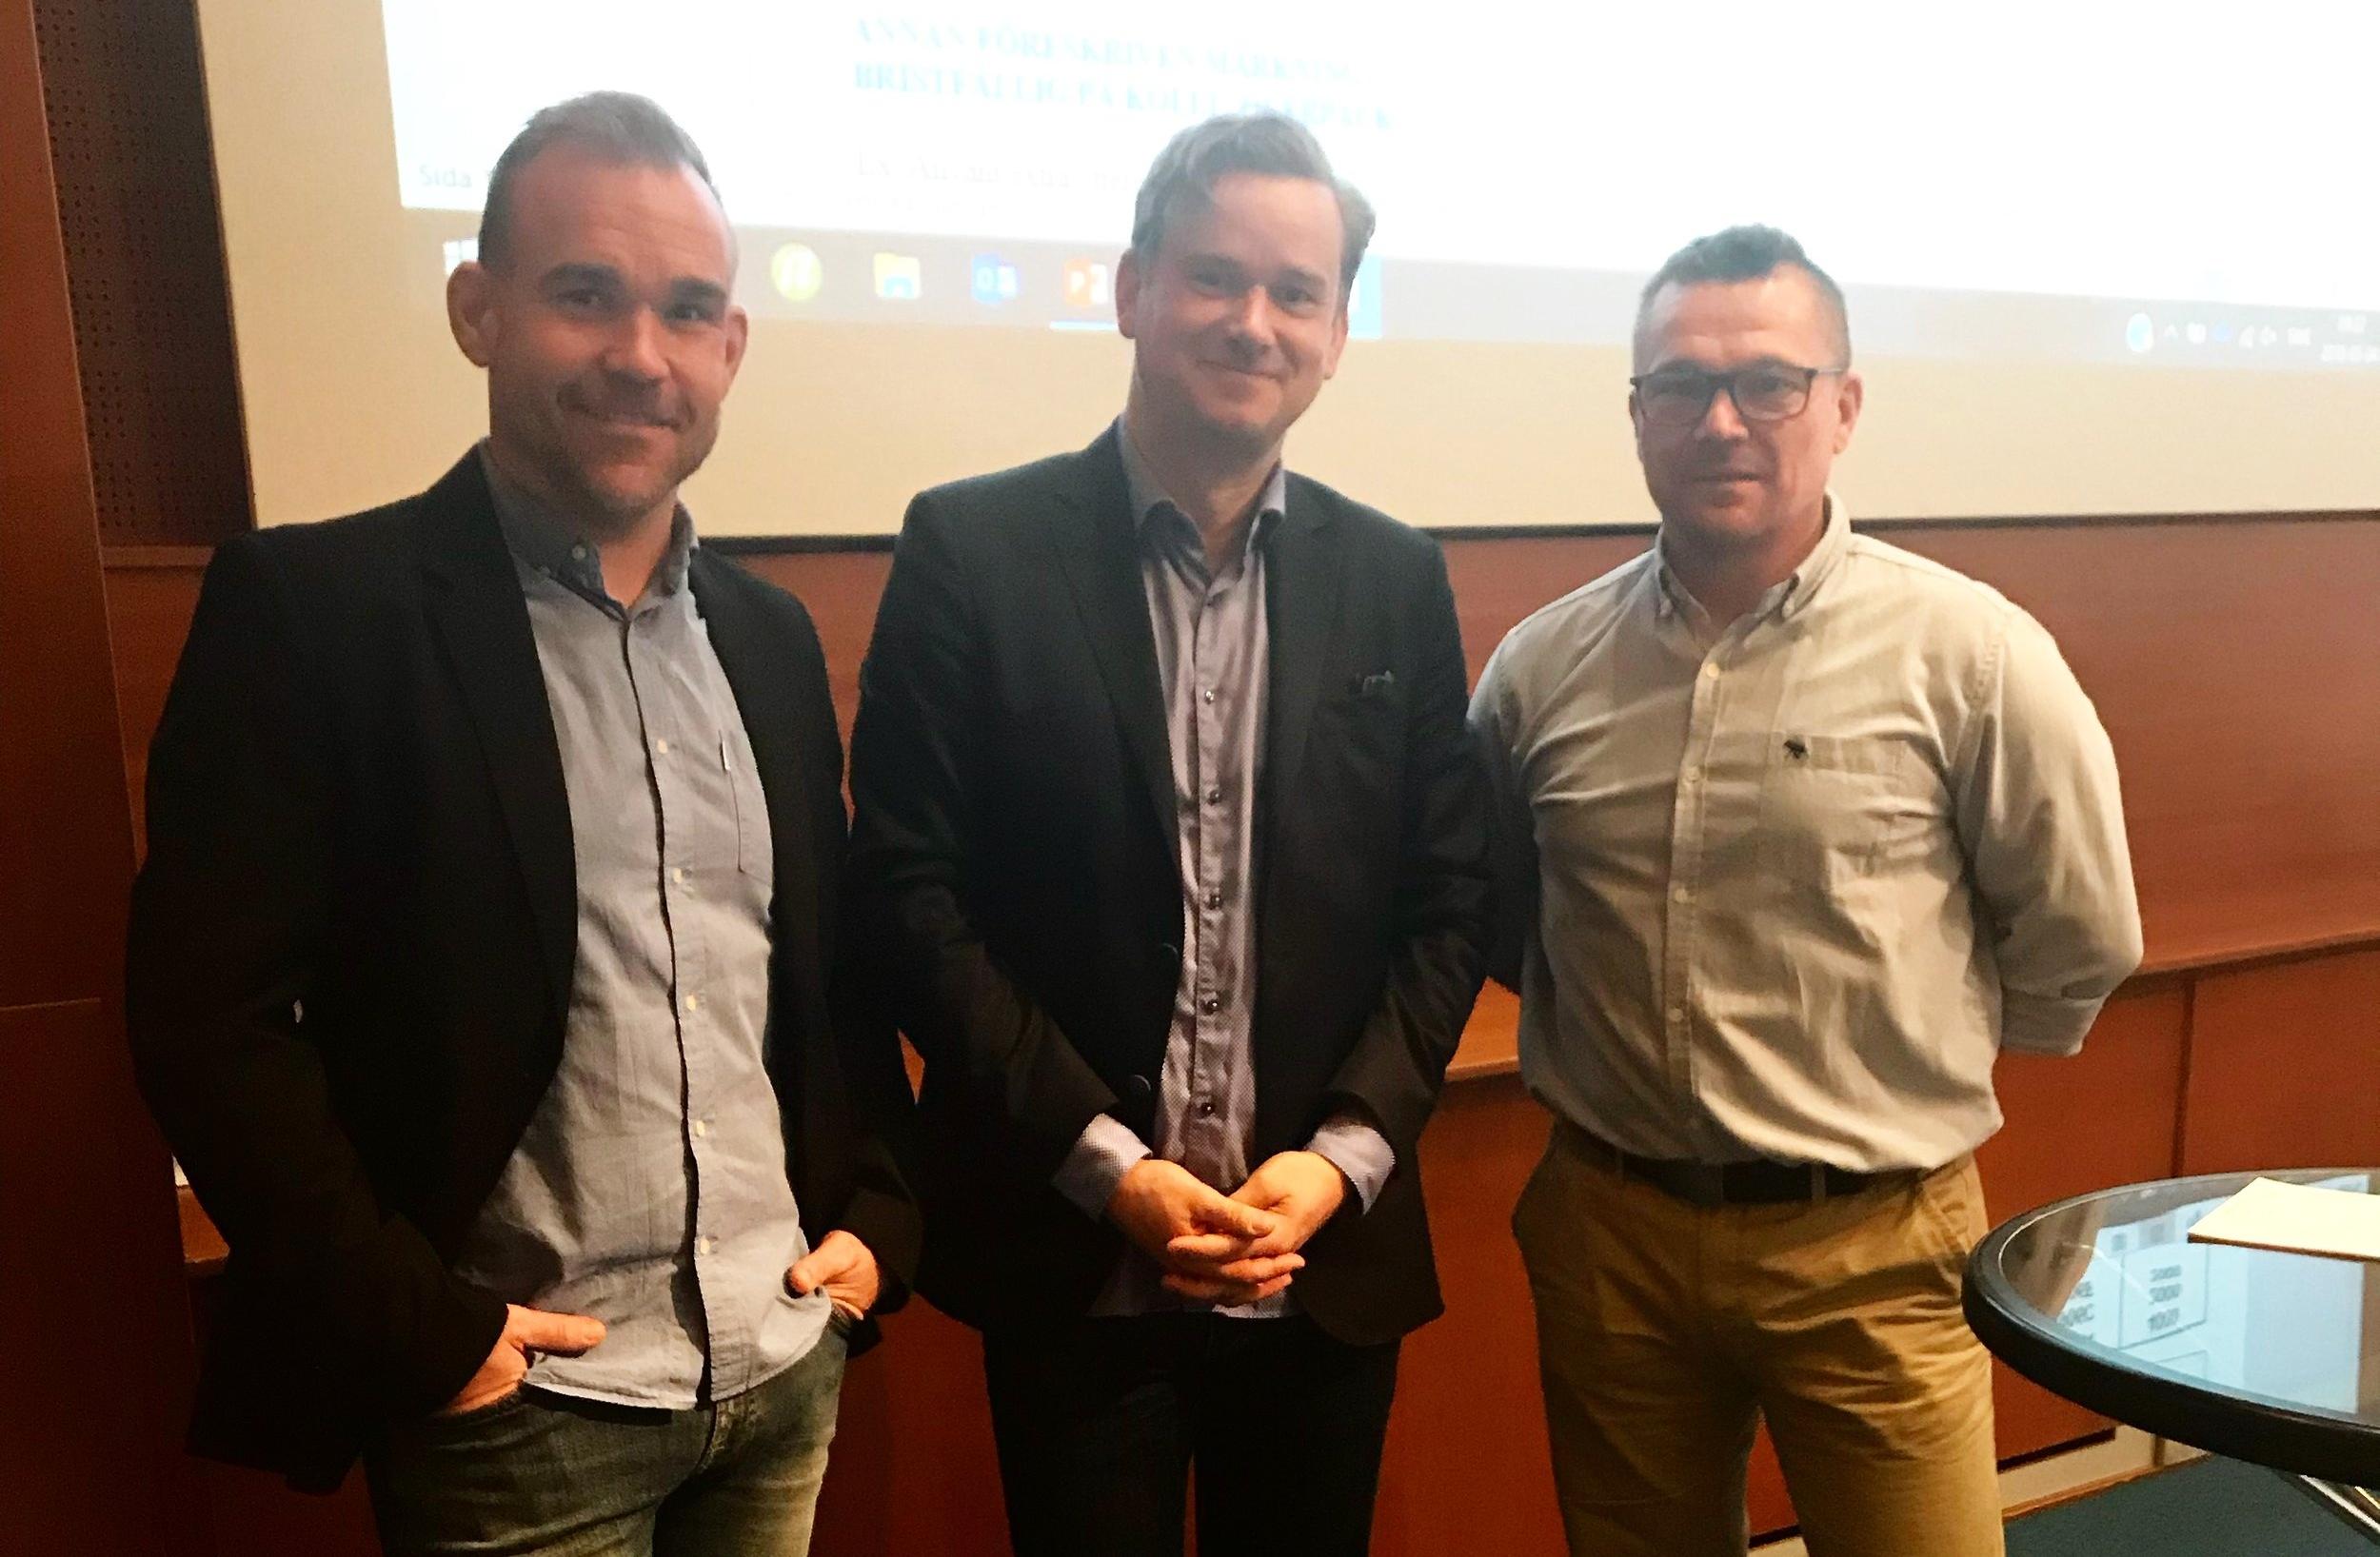 Mats Brodin, säkerhetsrådgivare DHL Freight, Pär Svahnberg, säkerhetsrådgivare KTF, Joacim Bengtson, Polisen